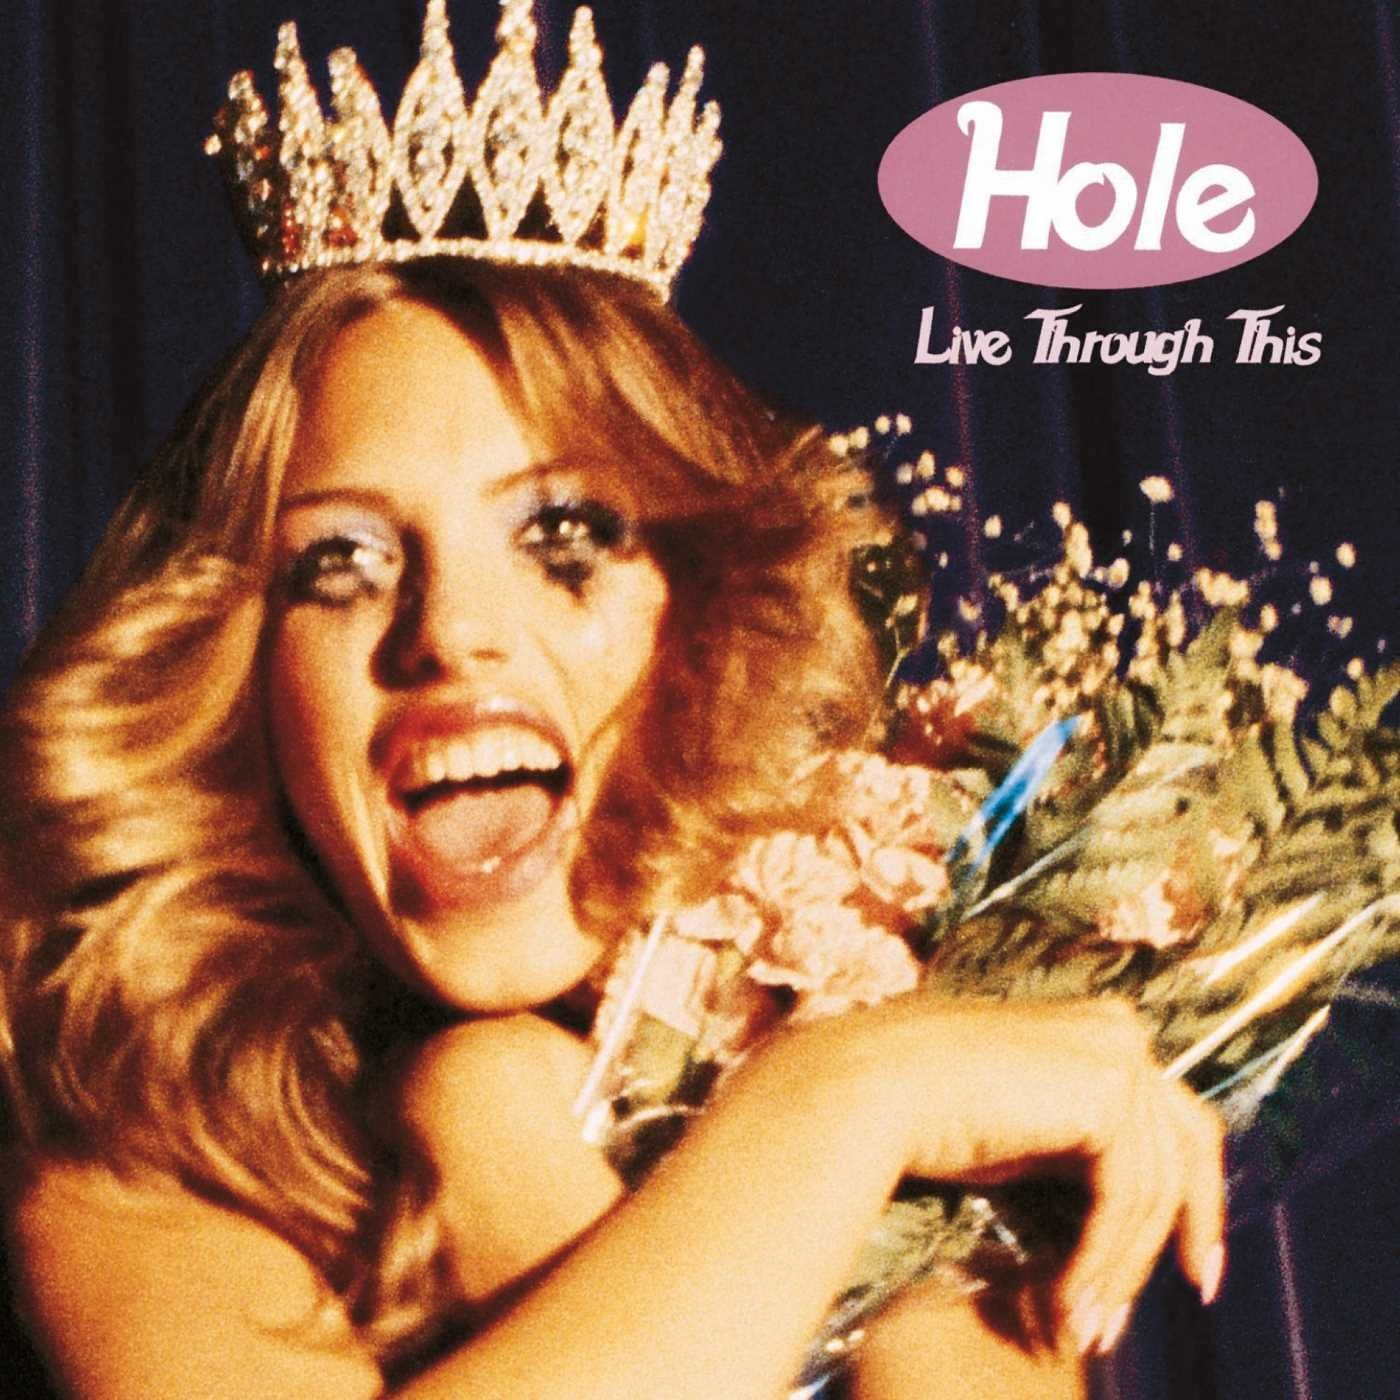 Hole - Live Through This (Red) Vinyl LP